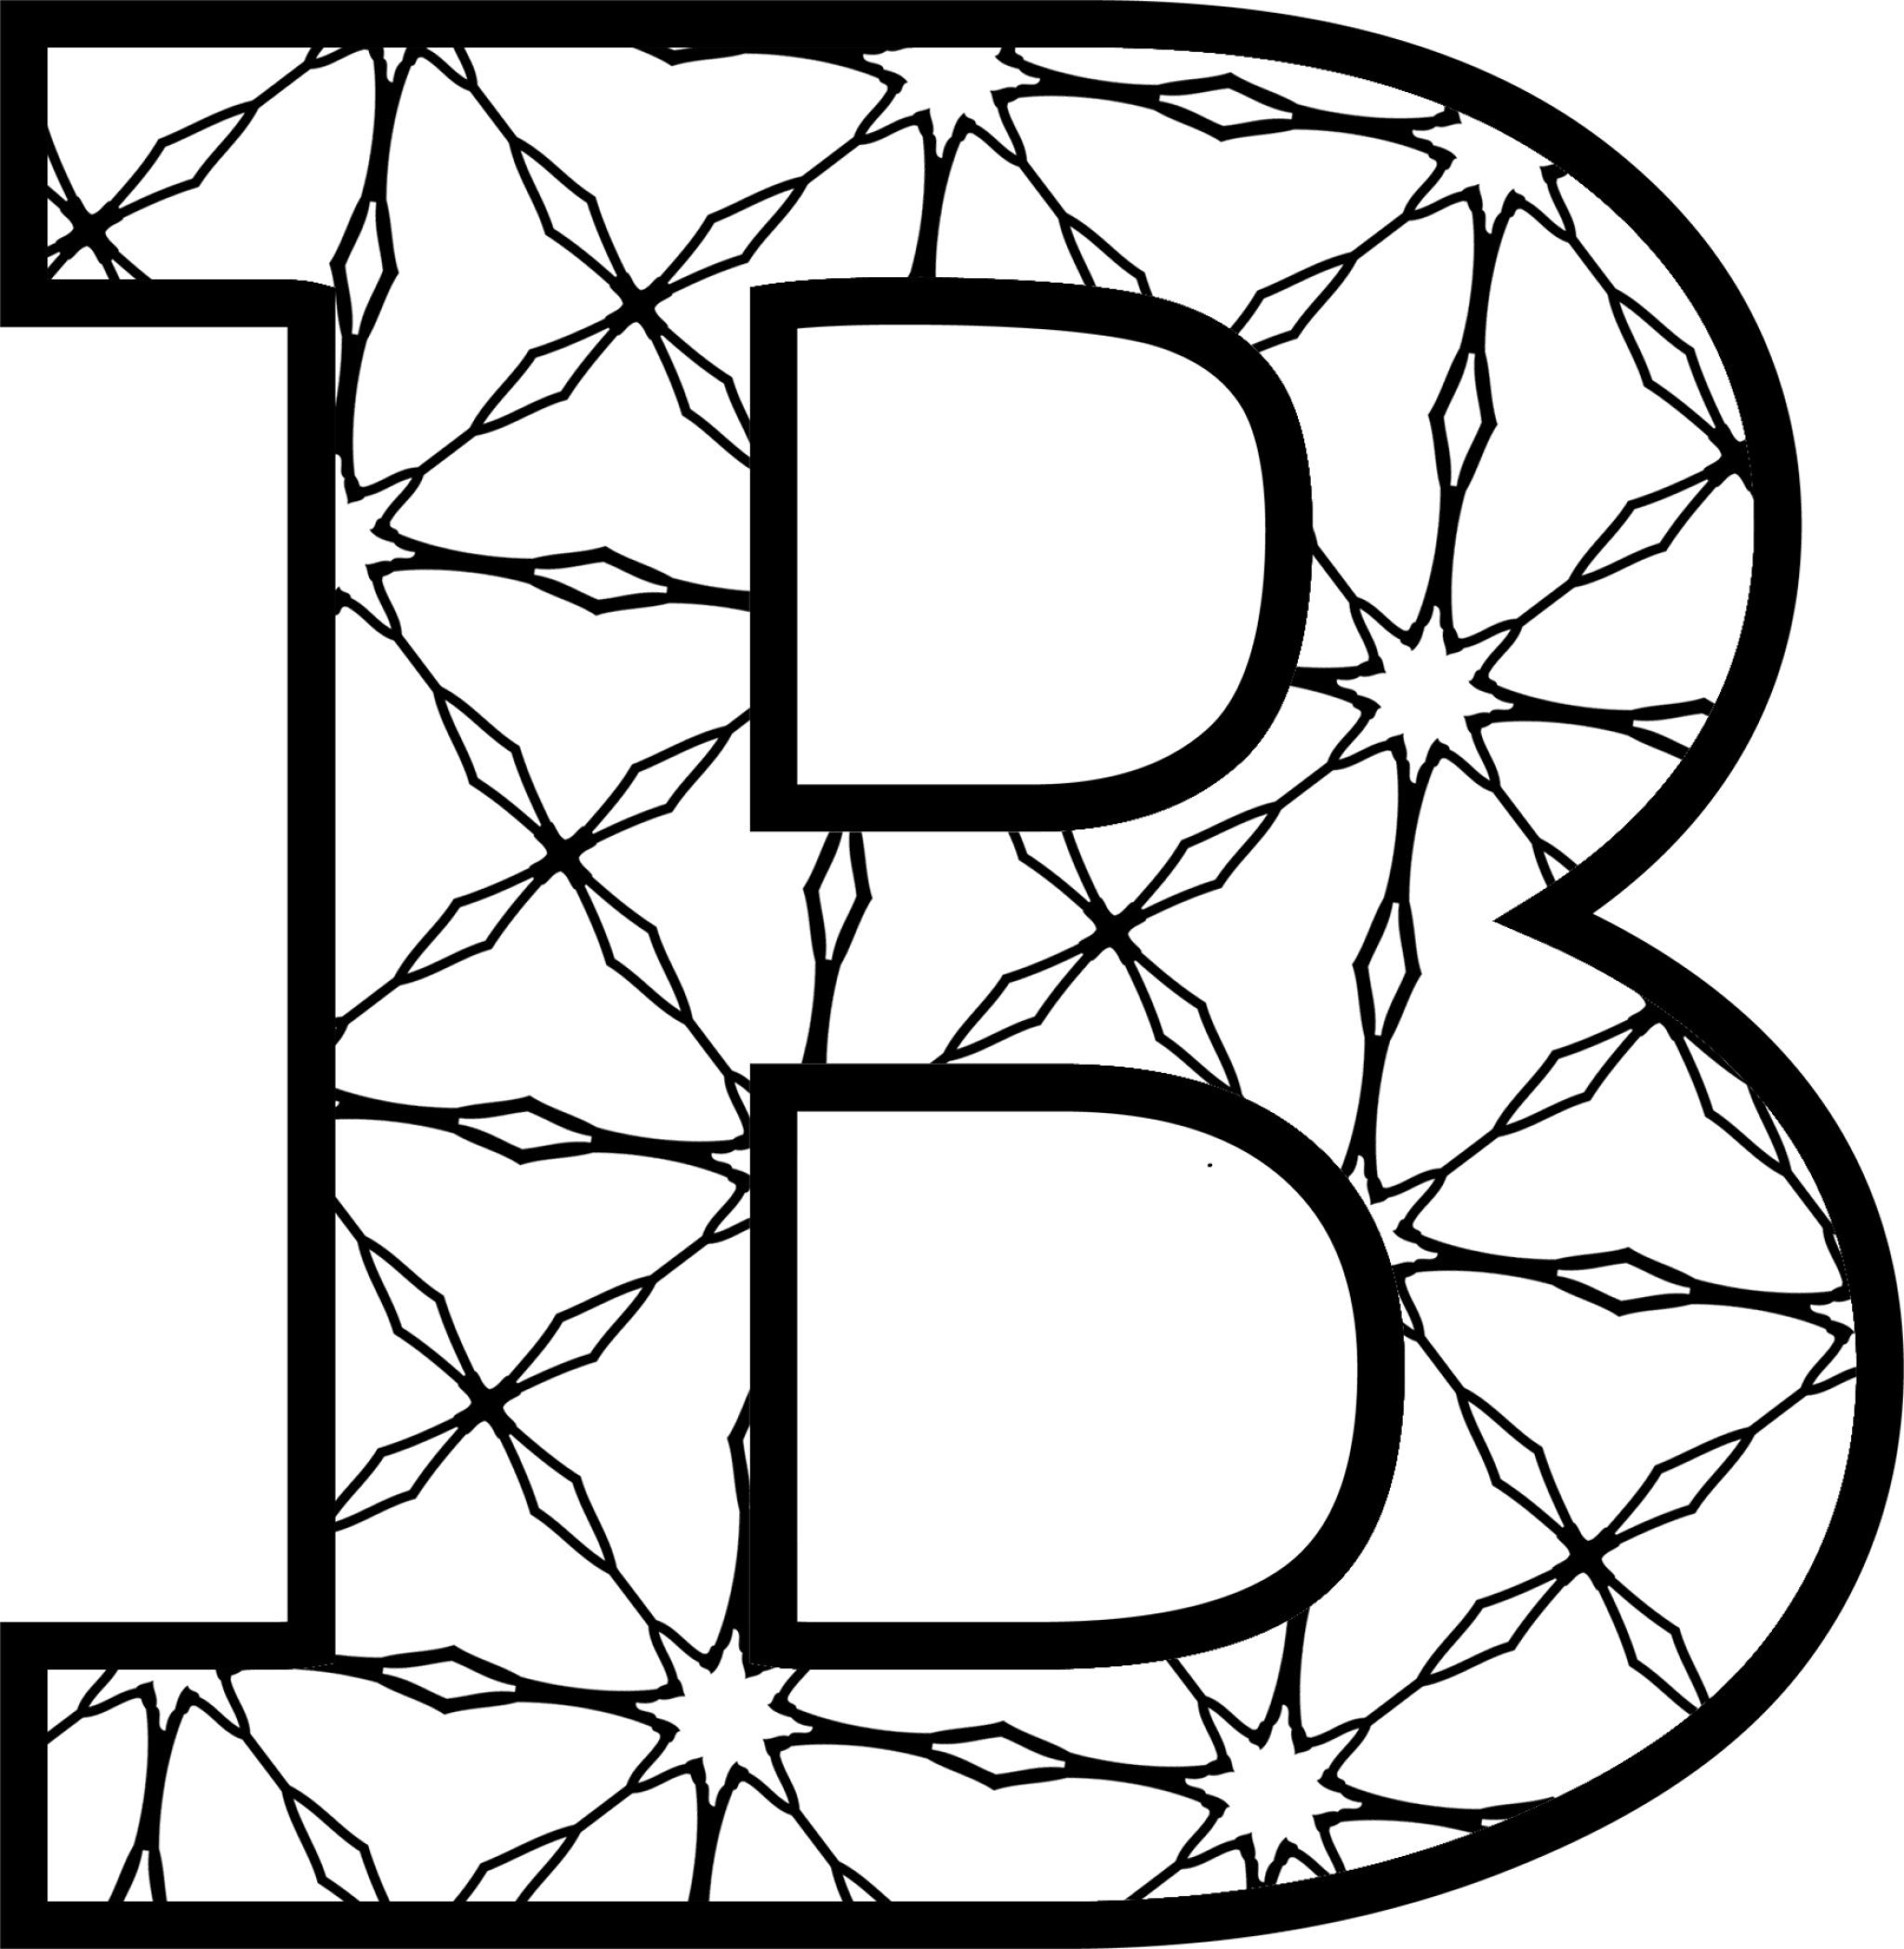 Free printable clip art alphabet letters picture transparent download Free Printable Alphabet Letters B Coloring Pages - Womanmate.com picture transparent download